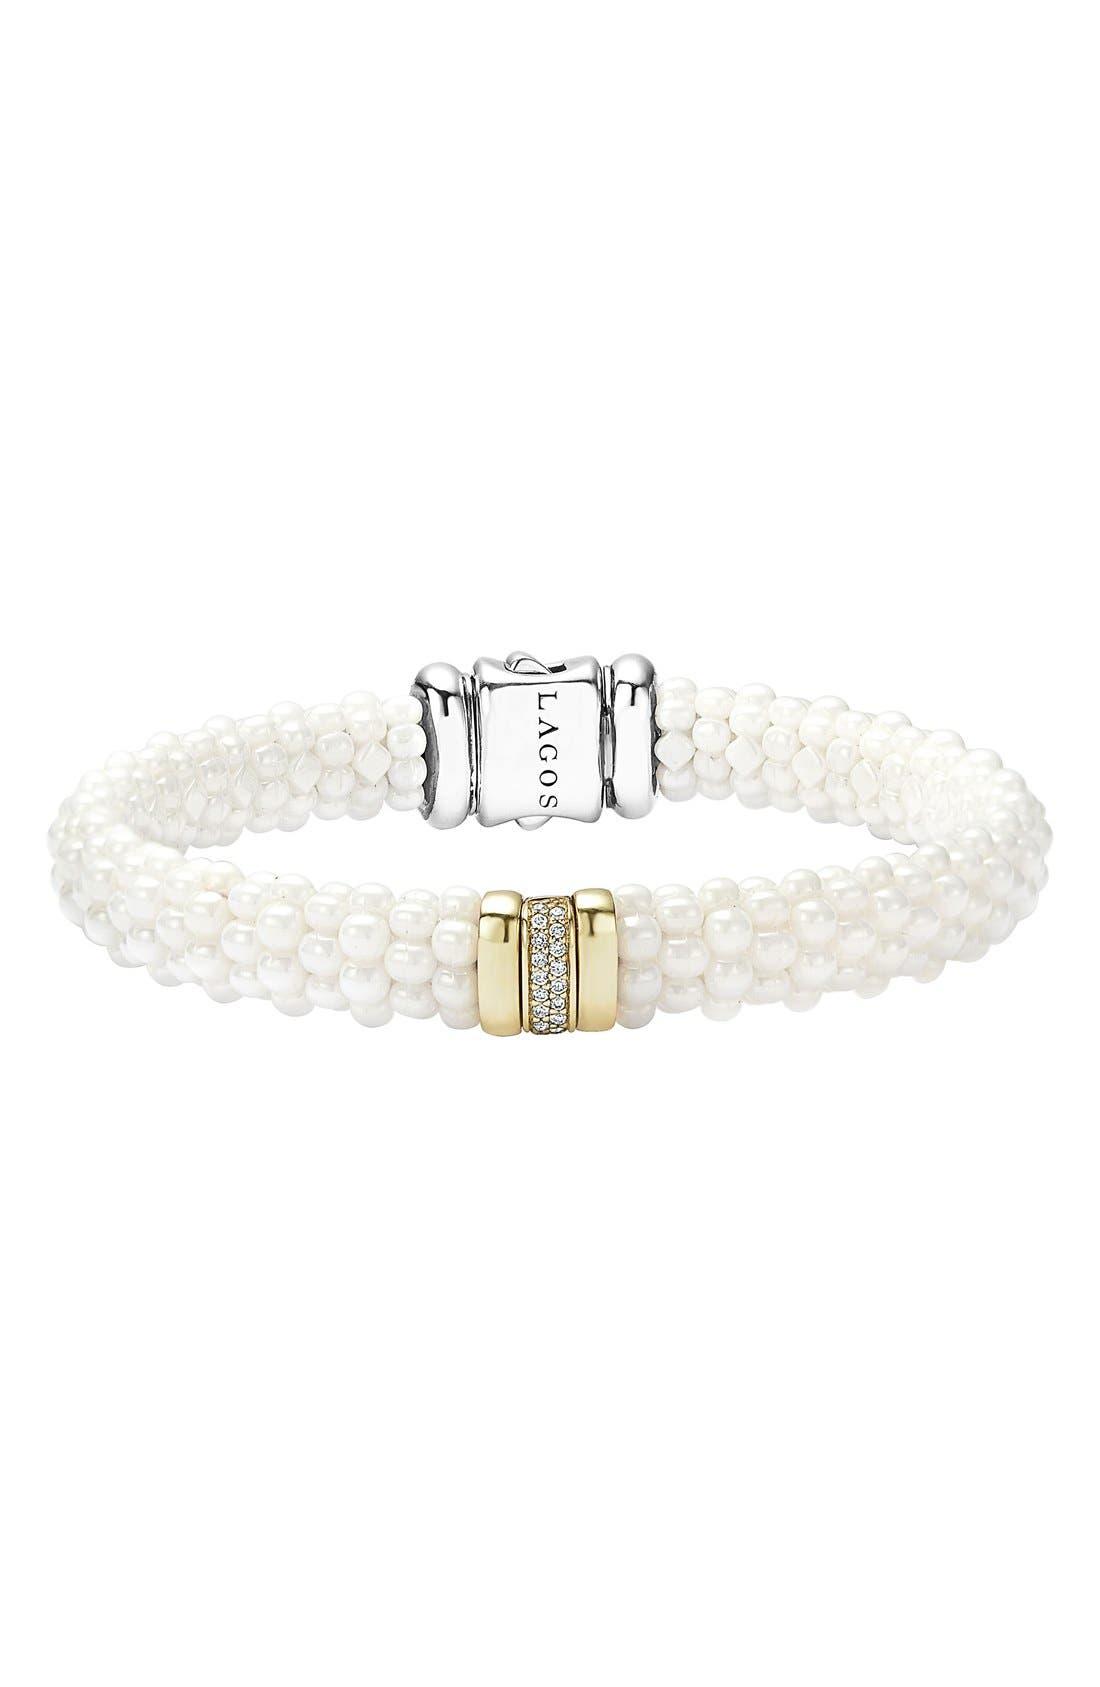 'White Caviar' Diamond Rope Bracelet,                             Main thumbnail 1, color,                             White Caviar/ Yellow Gold